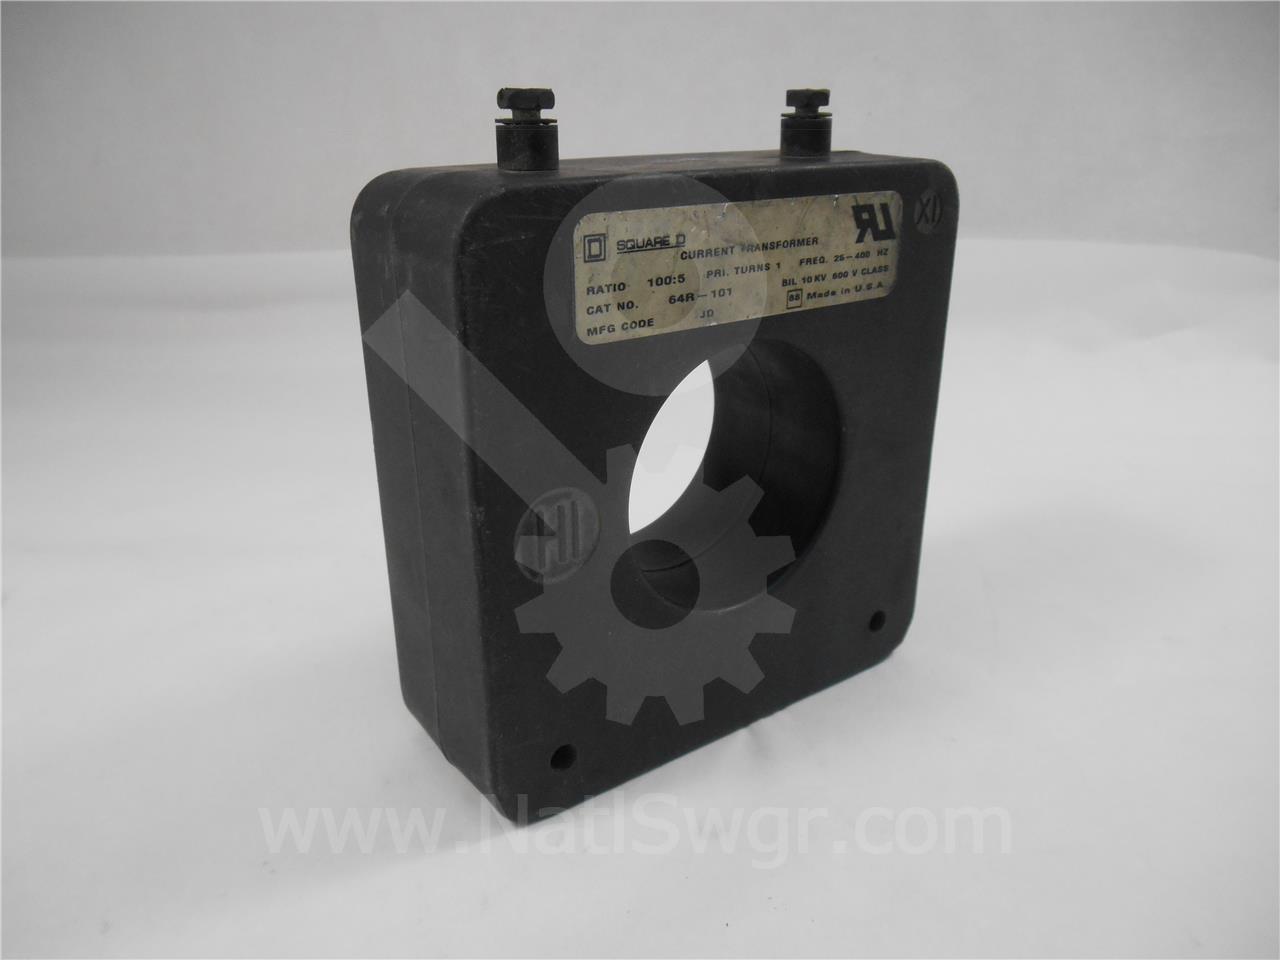 64R-101 Square D CURRENT TRANSFORMER100:5 C10